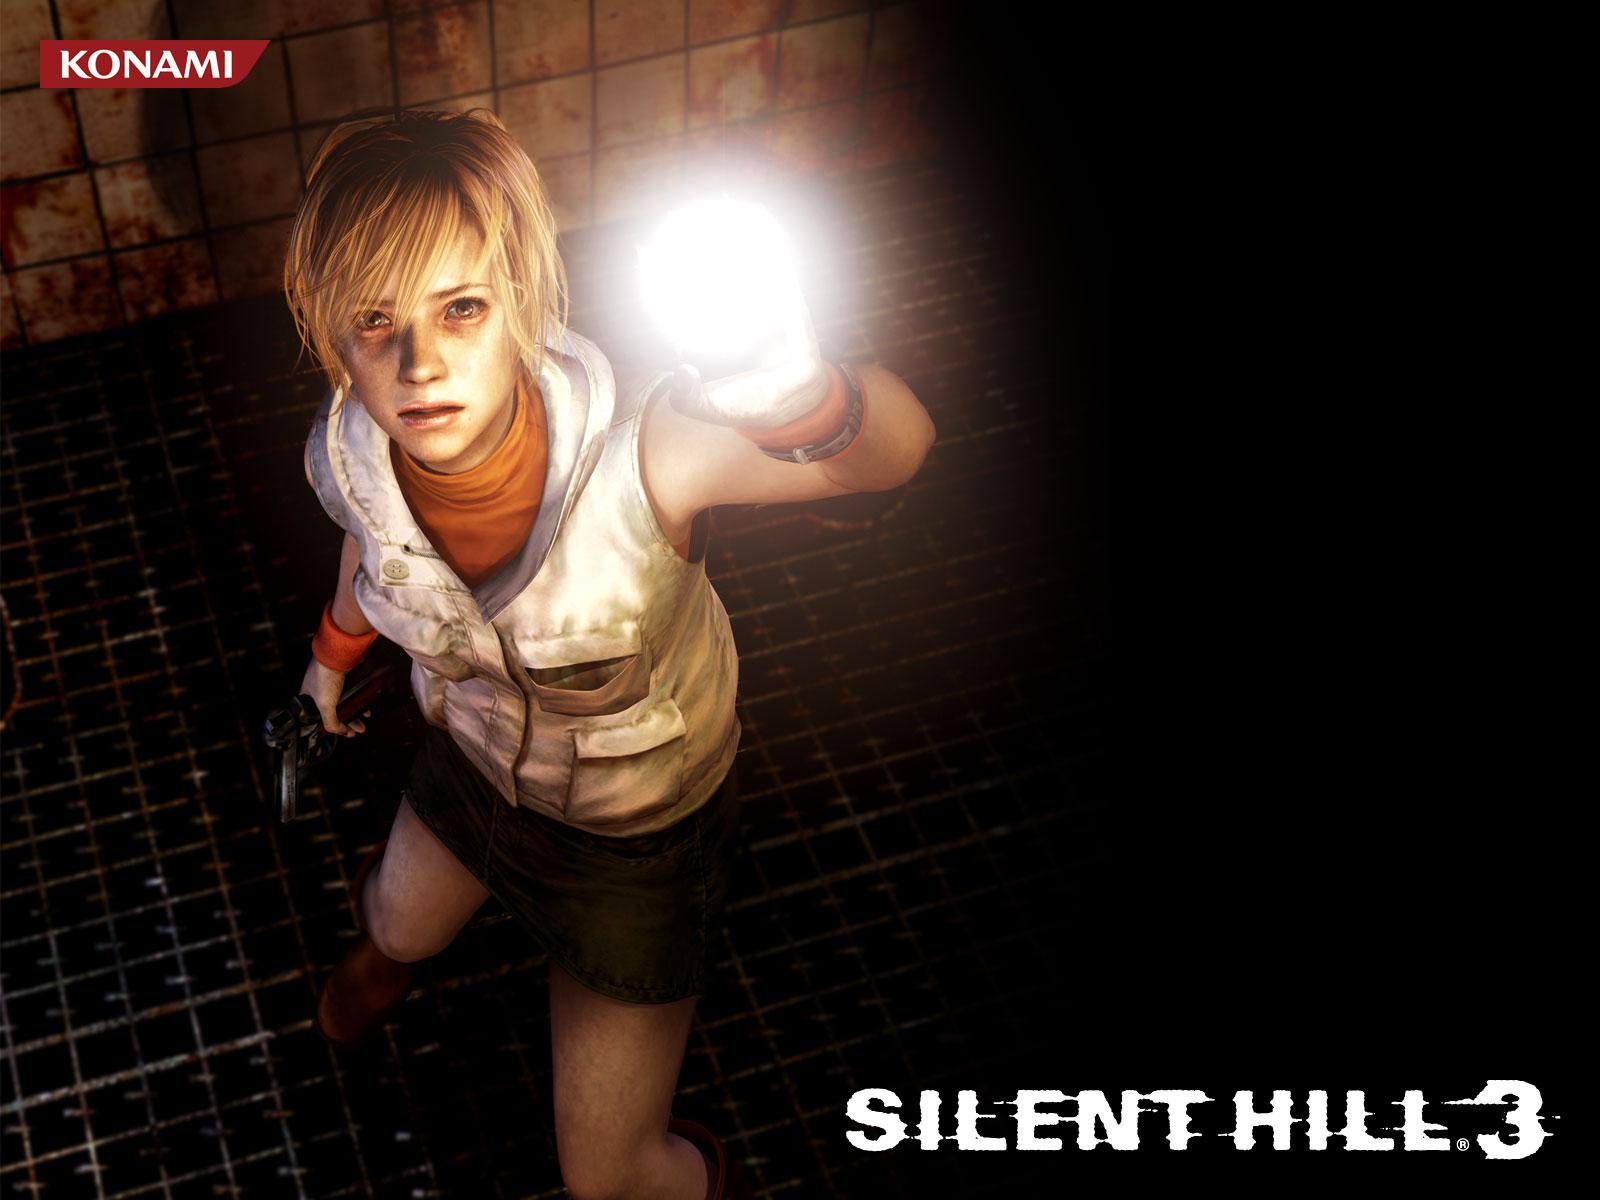 Silent Hill 3 wallpapers or desktop backgrounds